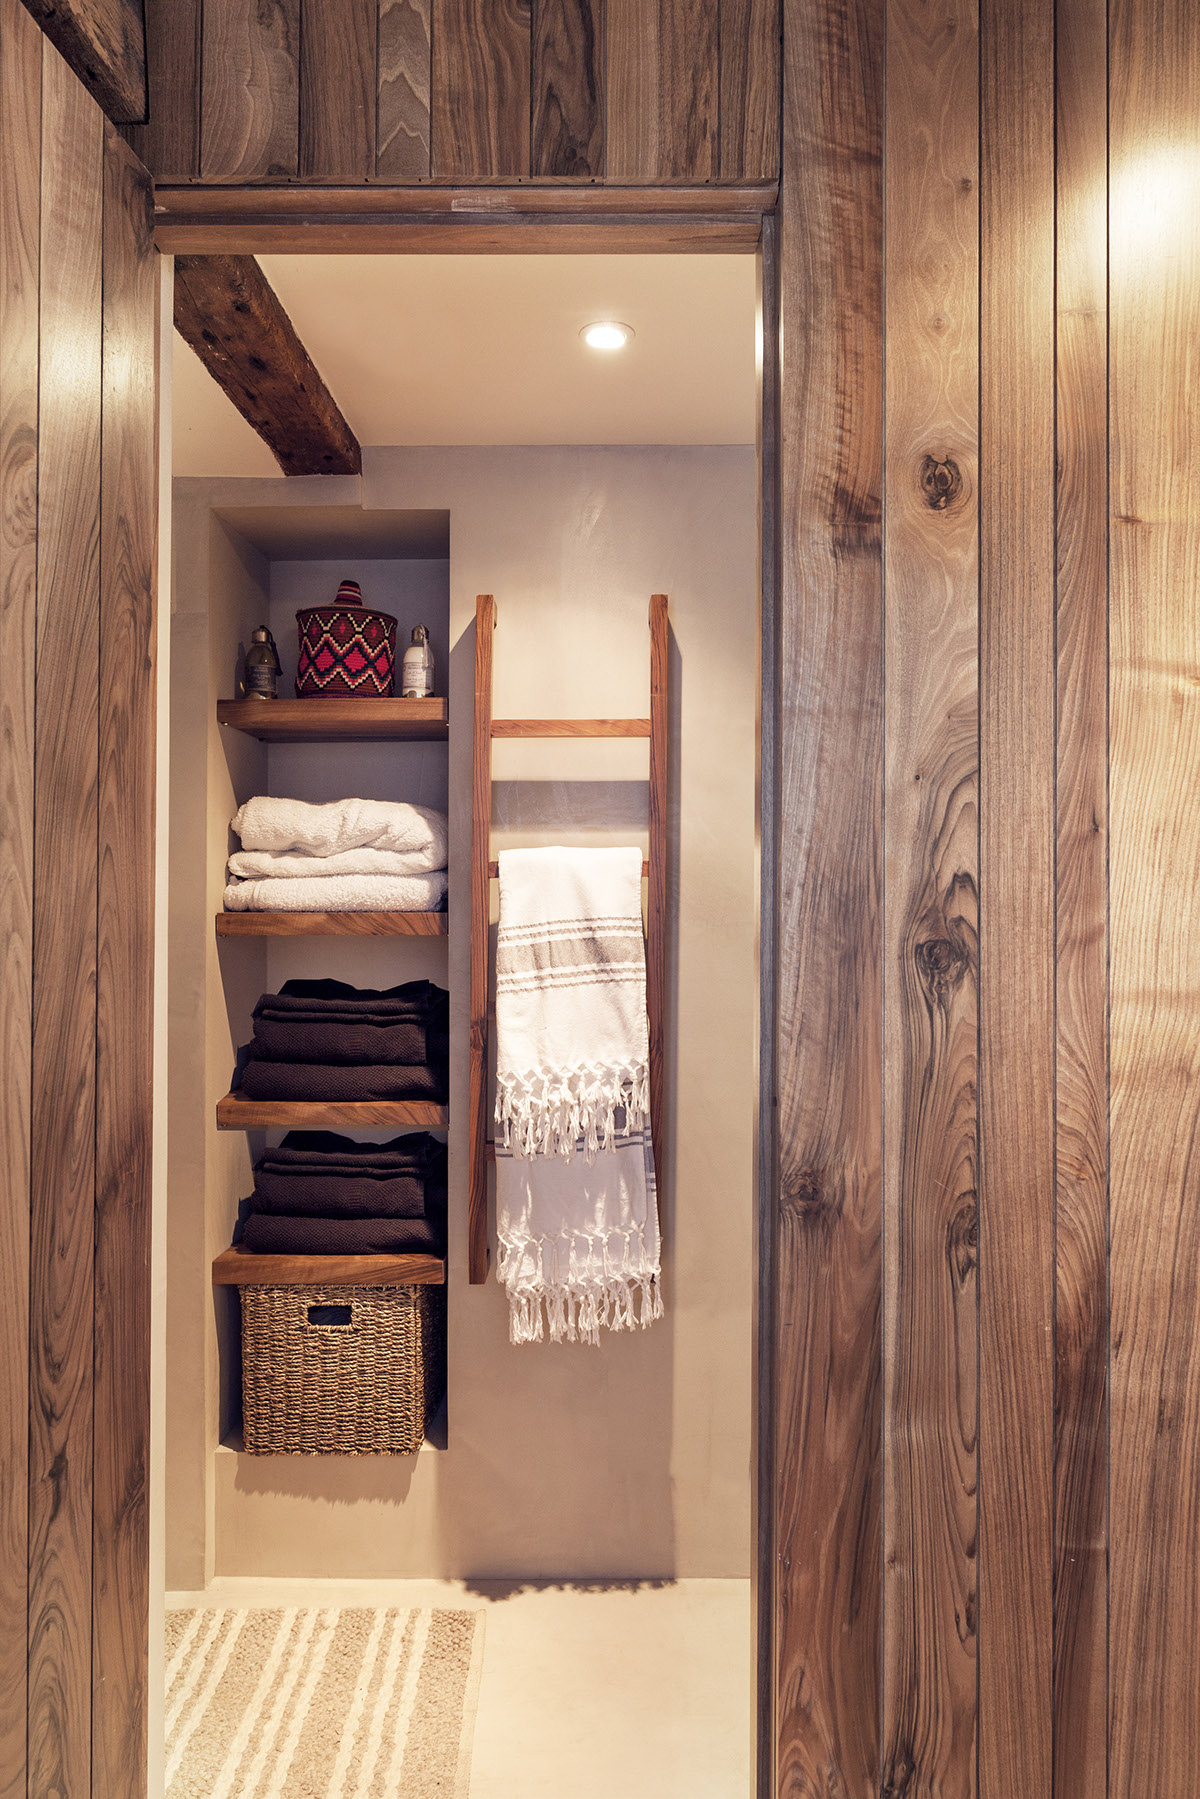 Hall Closet Organization and Design Ideas | HGTV